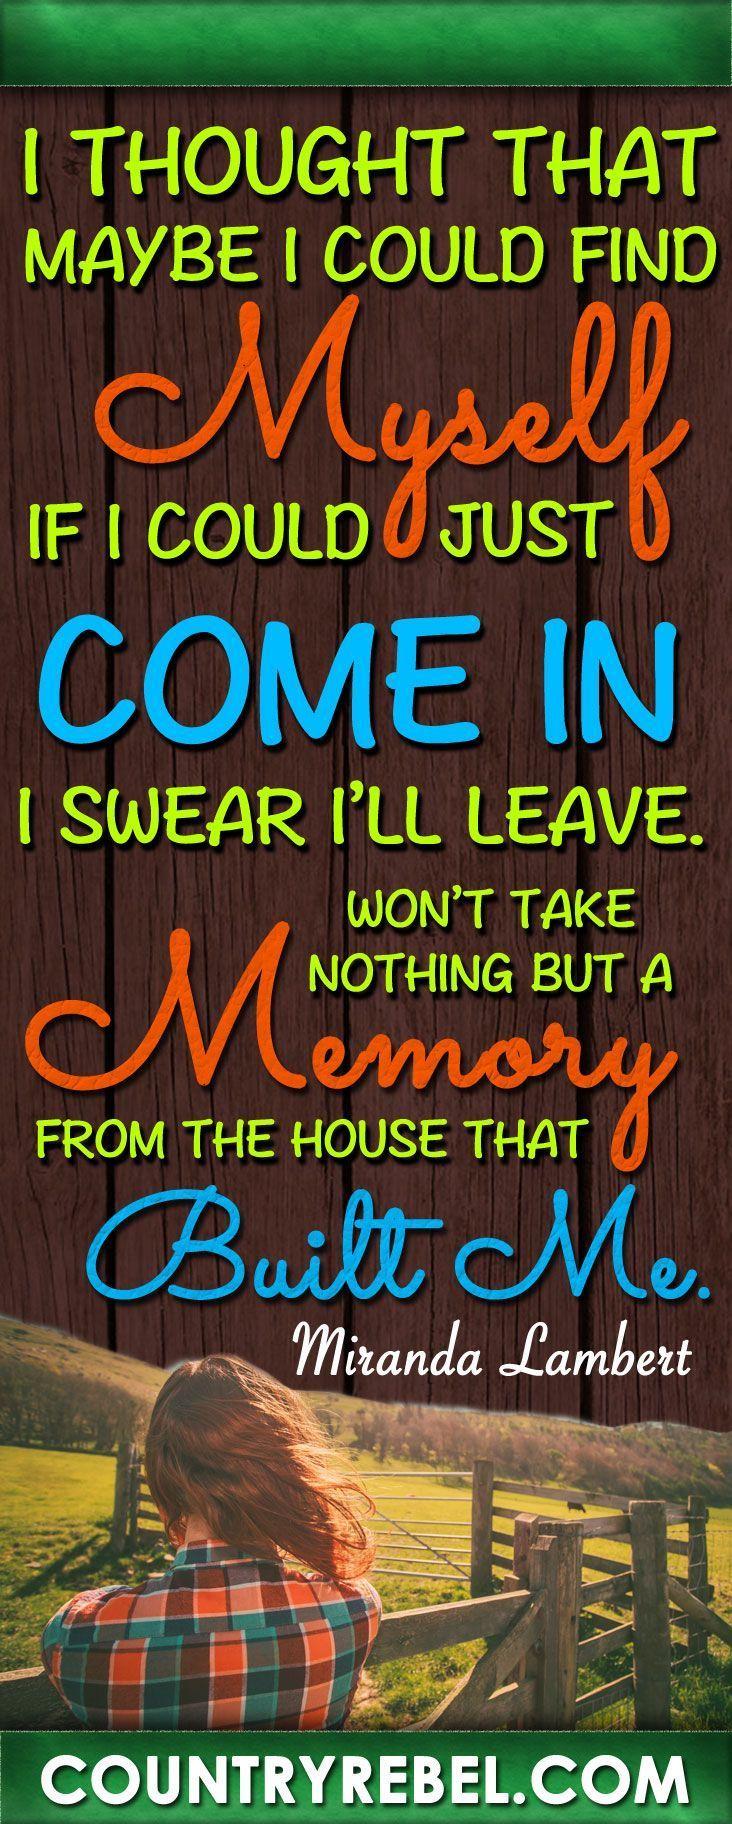 Miranda Lambert The House That Built Me Lyrics and Country Music Video http://countryrebel.com/blogs/videos/19108231-beautiful-rendition-of-miranda-lamberts-the-house-that-built-me